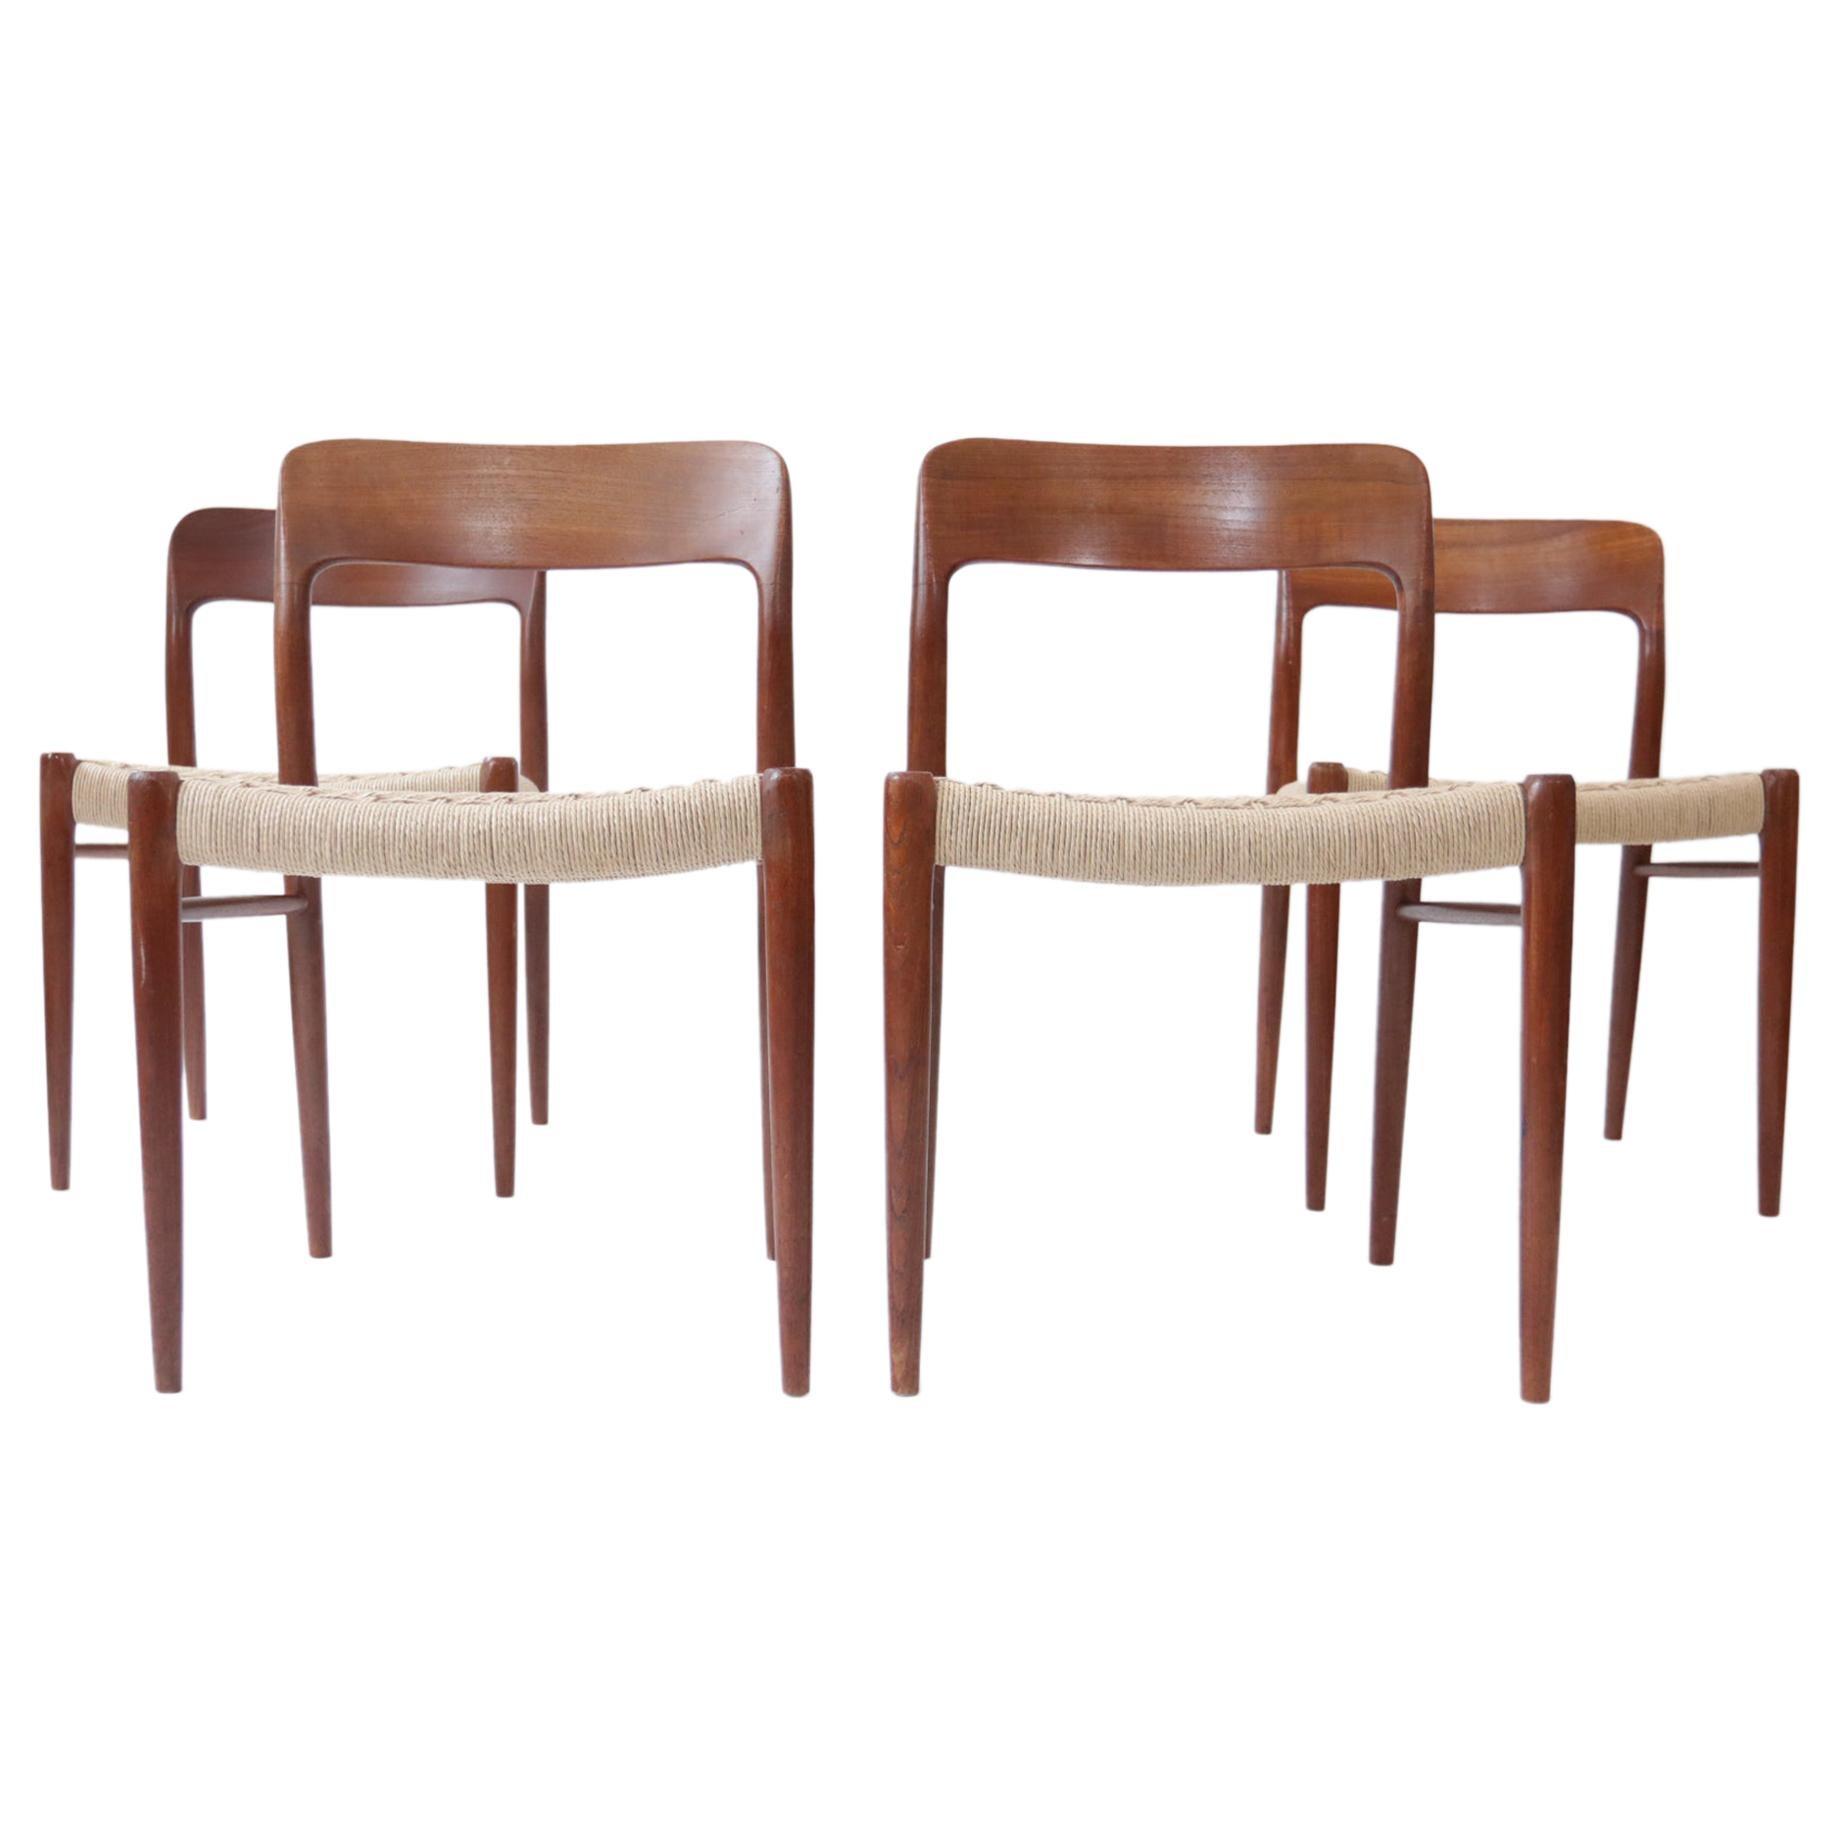 Danish Design Niels Otto Moller Model 75 Dining Chairs JL Moller Møbelfabrik